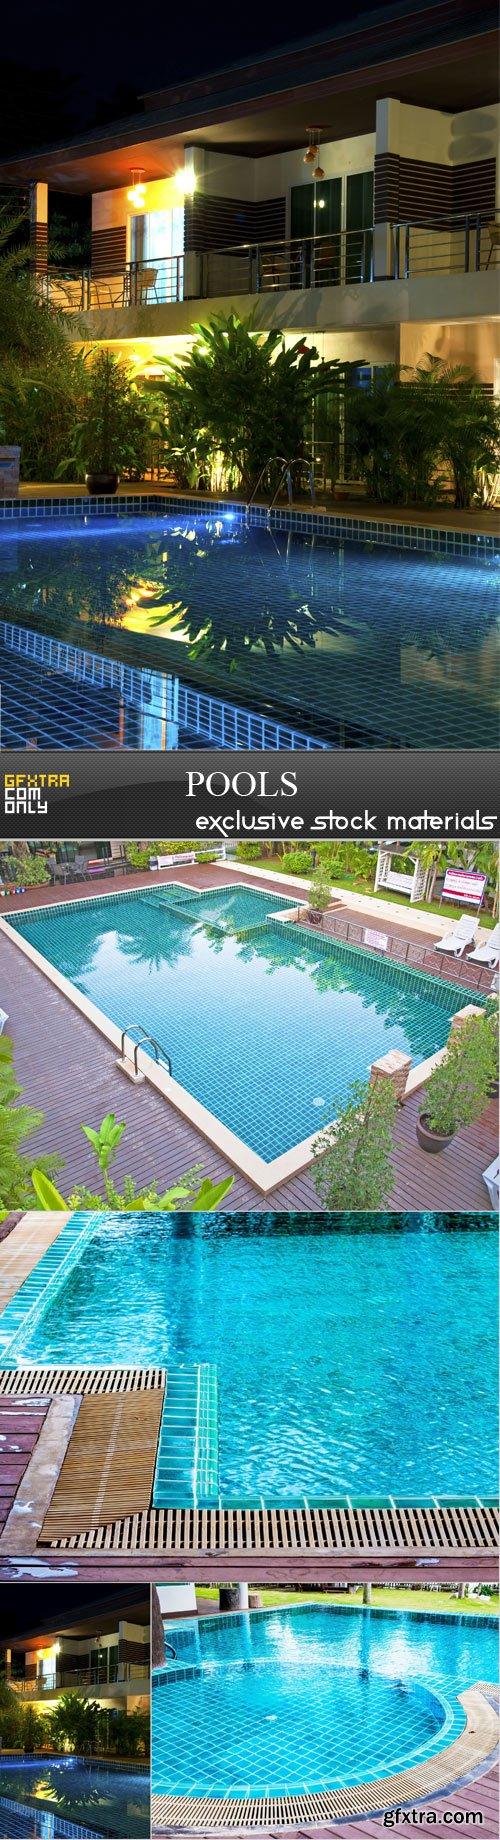 Pools - 4 JPRGs